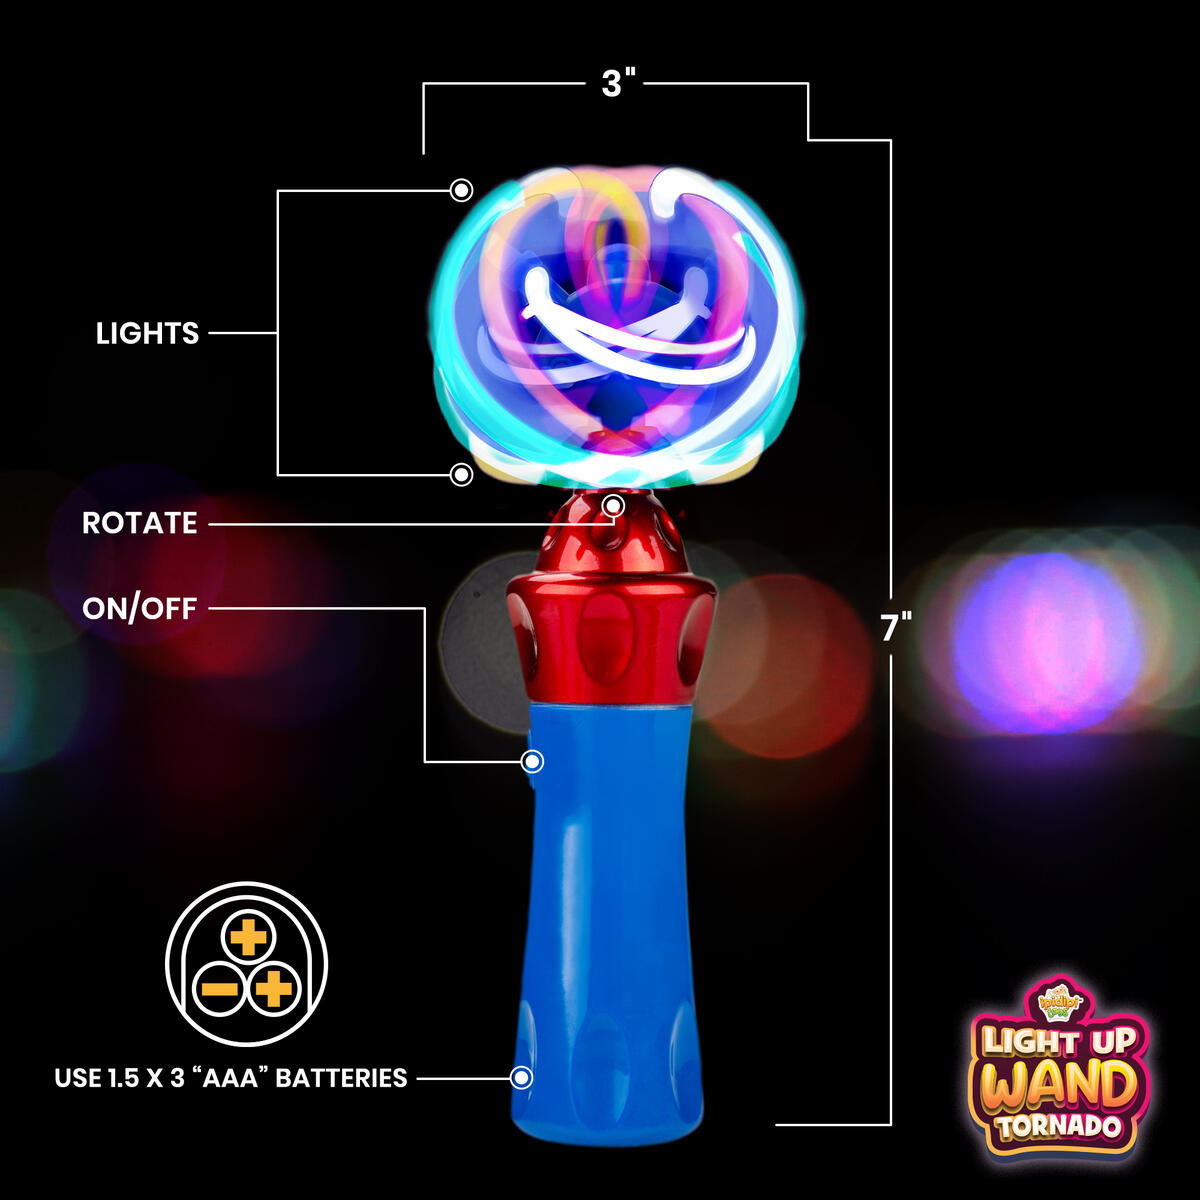 Spinning Light-Up Wand